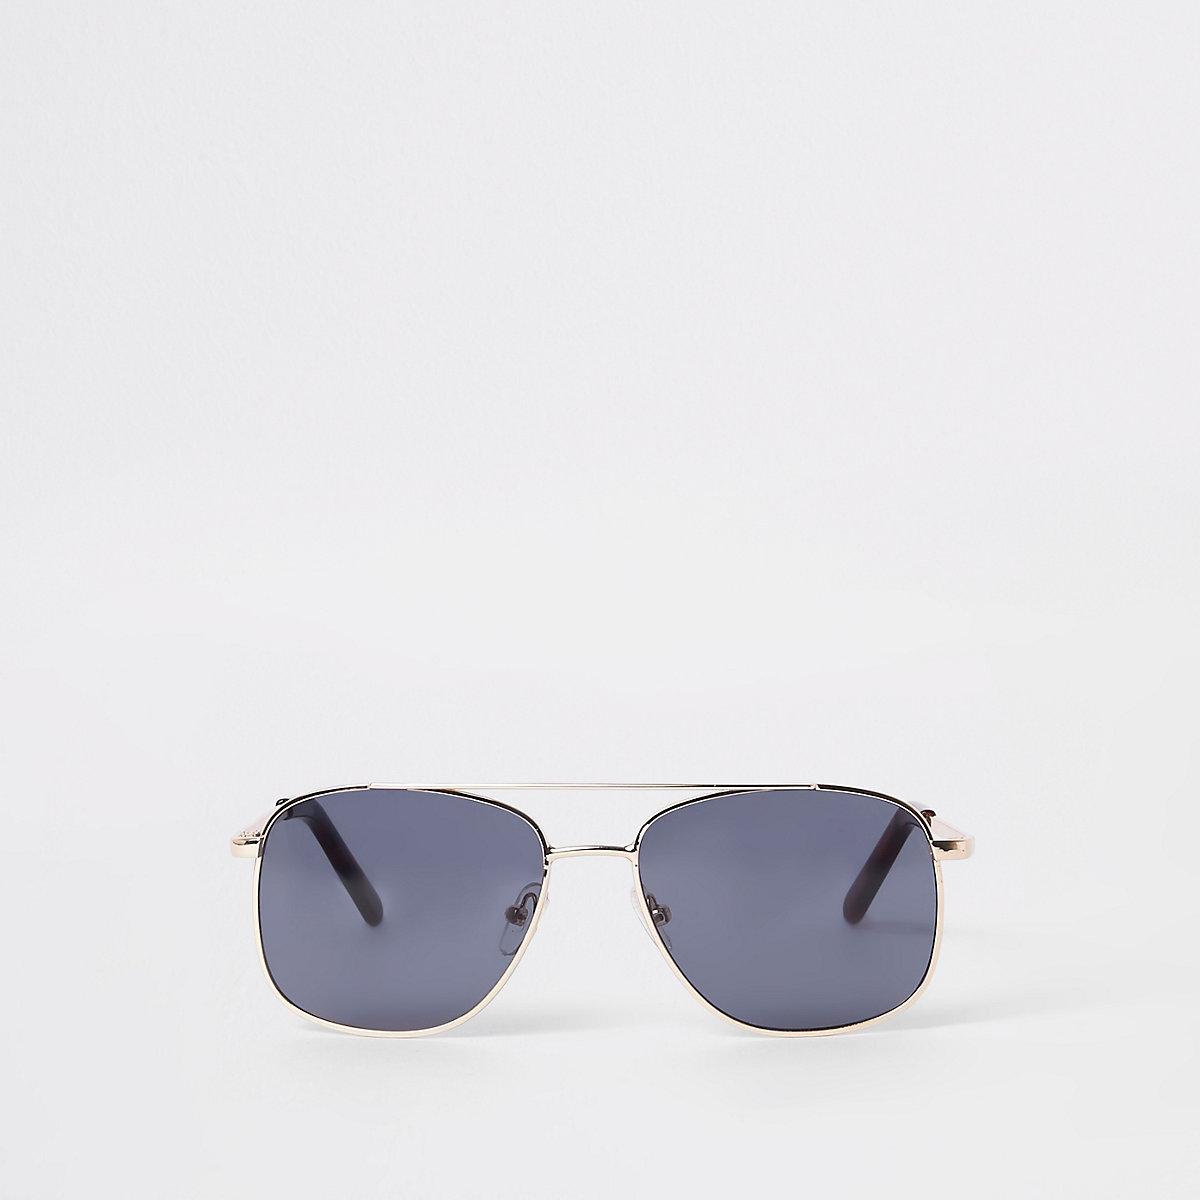 Boys gold tone round aviator sunglasses